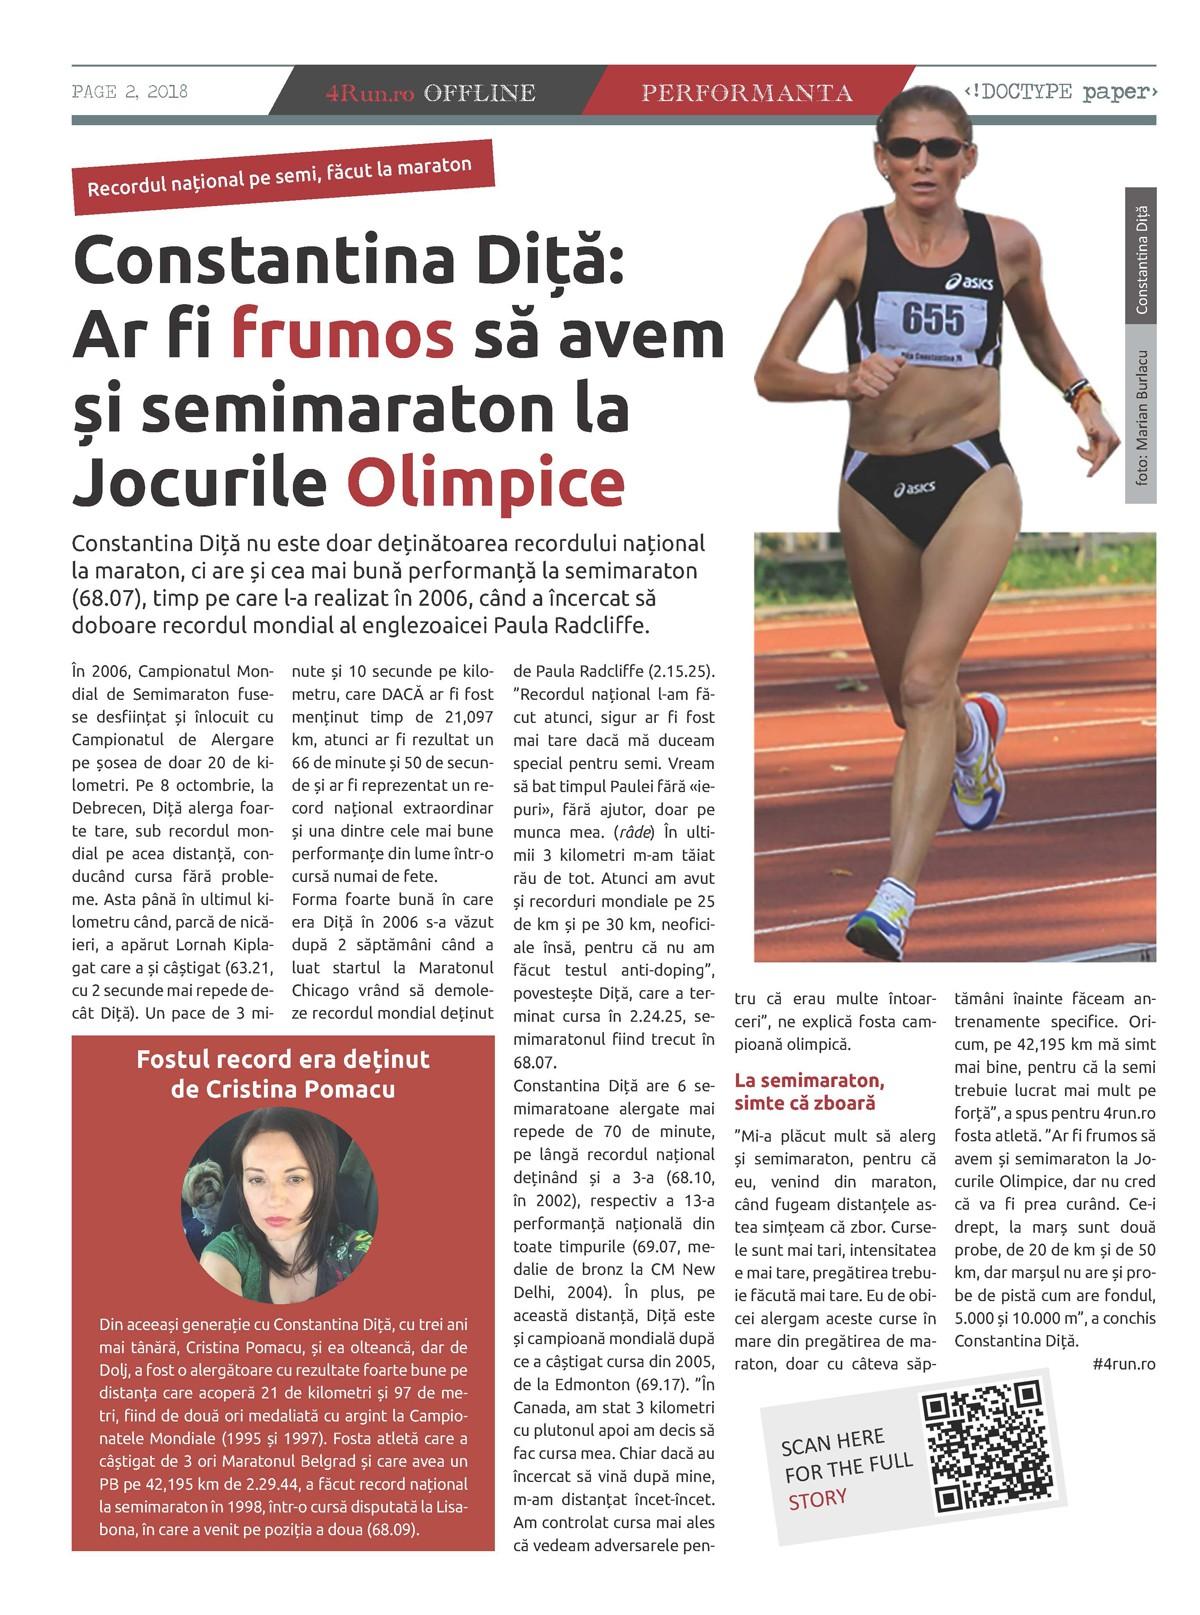 Pagina 2, ziarul 4run.ro OFFLINE